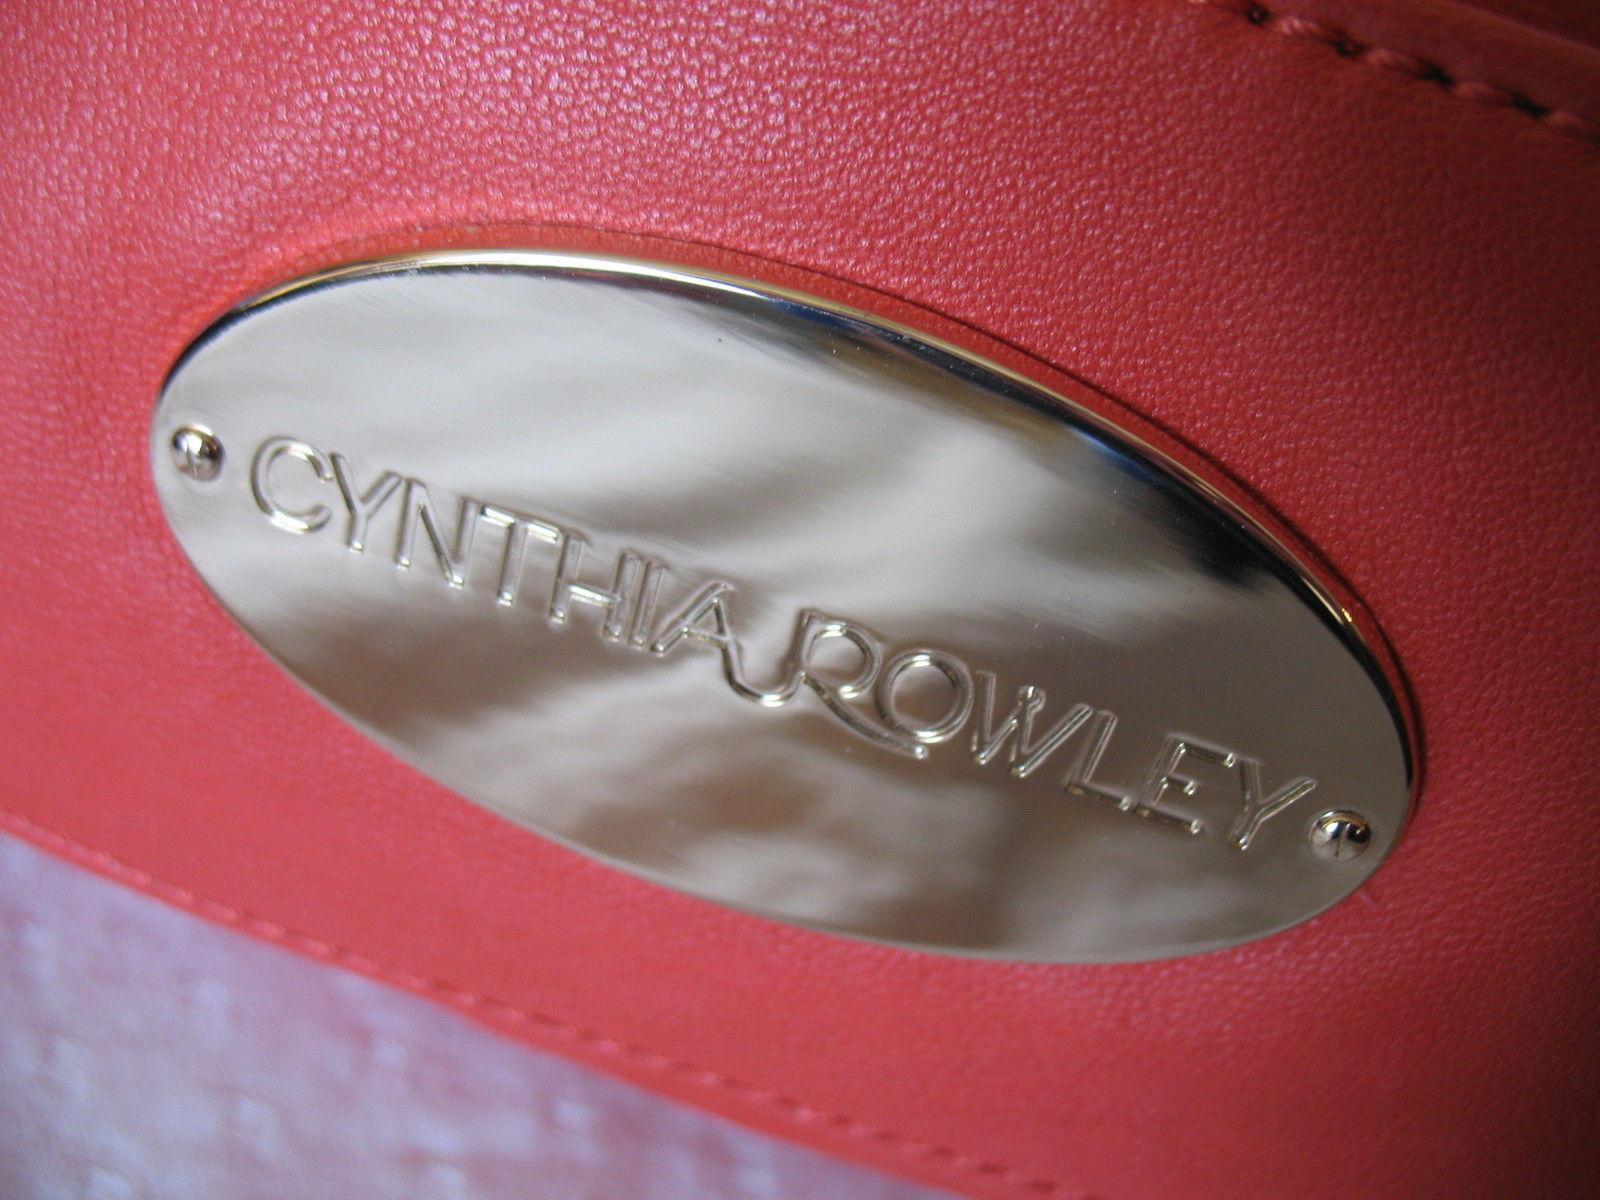 Cynthia Rowley New Purse Handbag Leather Crossbody Calloway Orange Coral White image 4